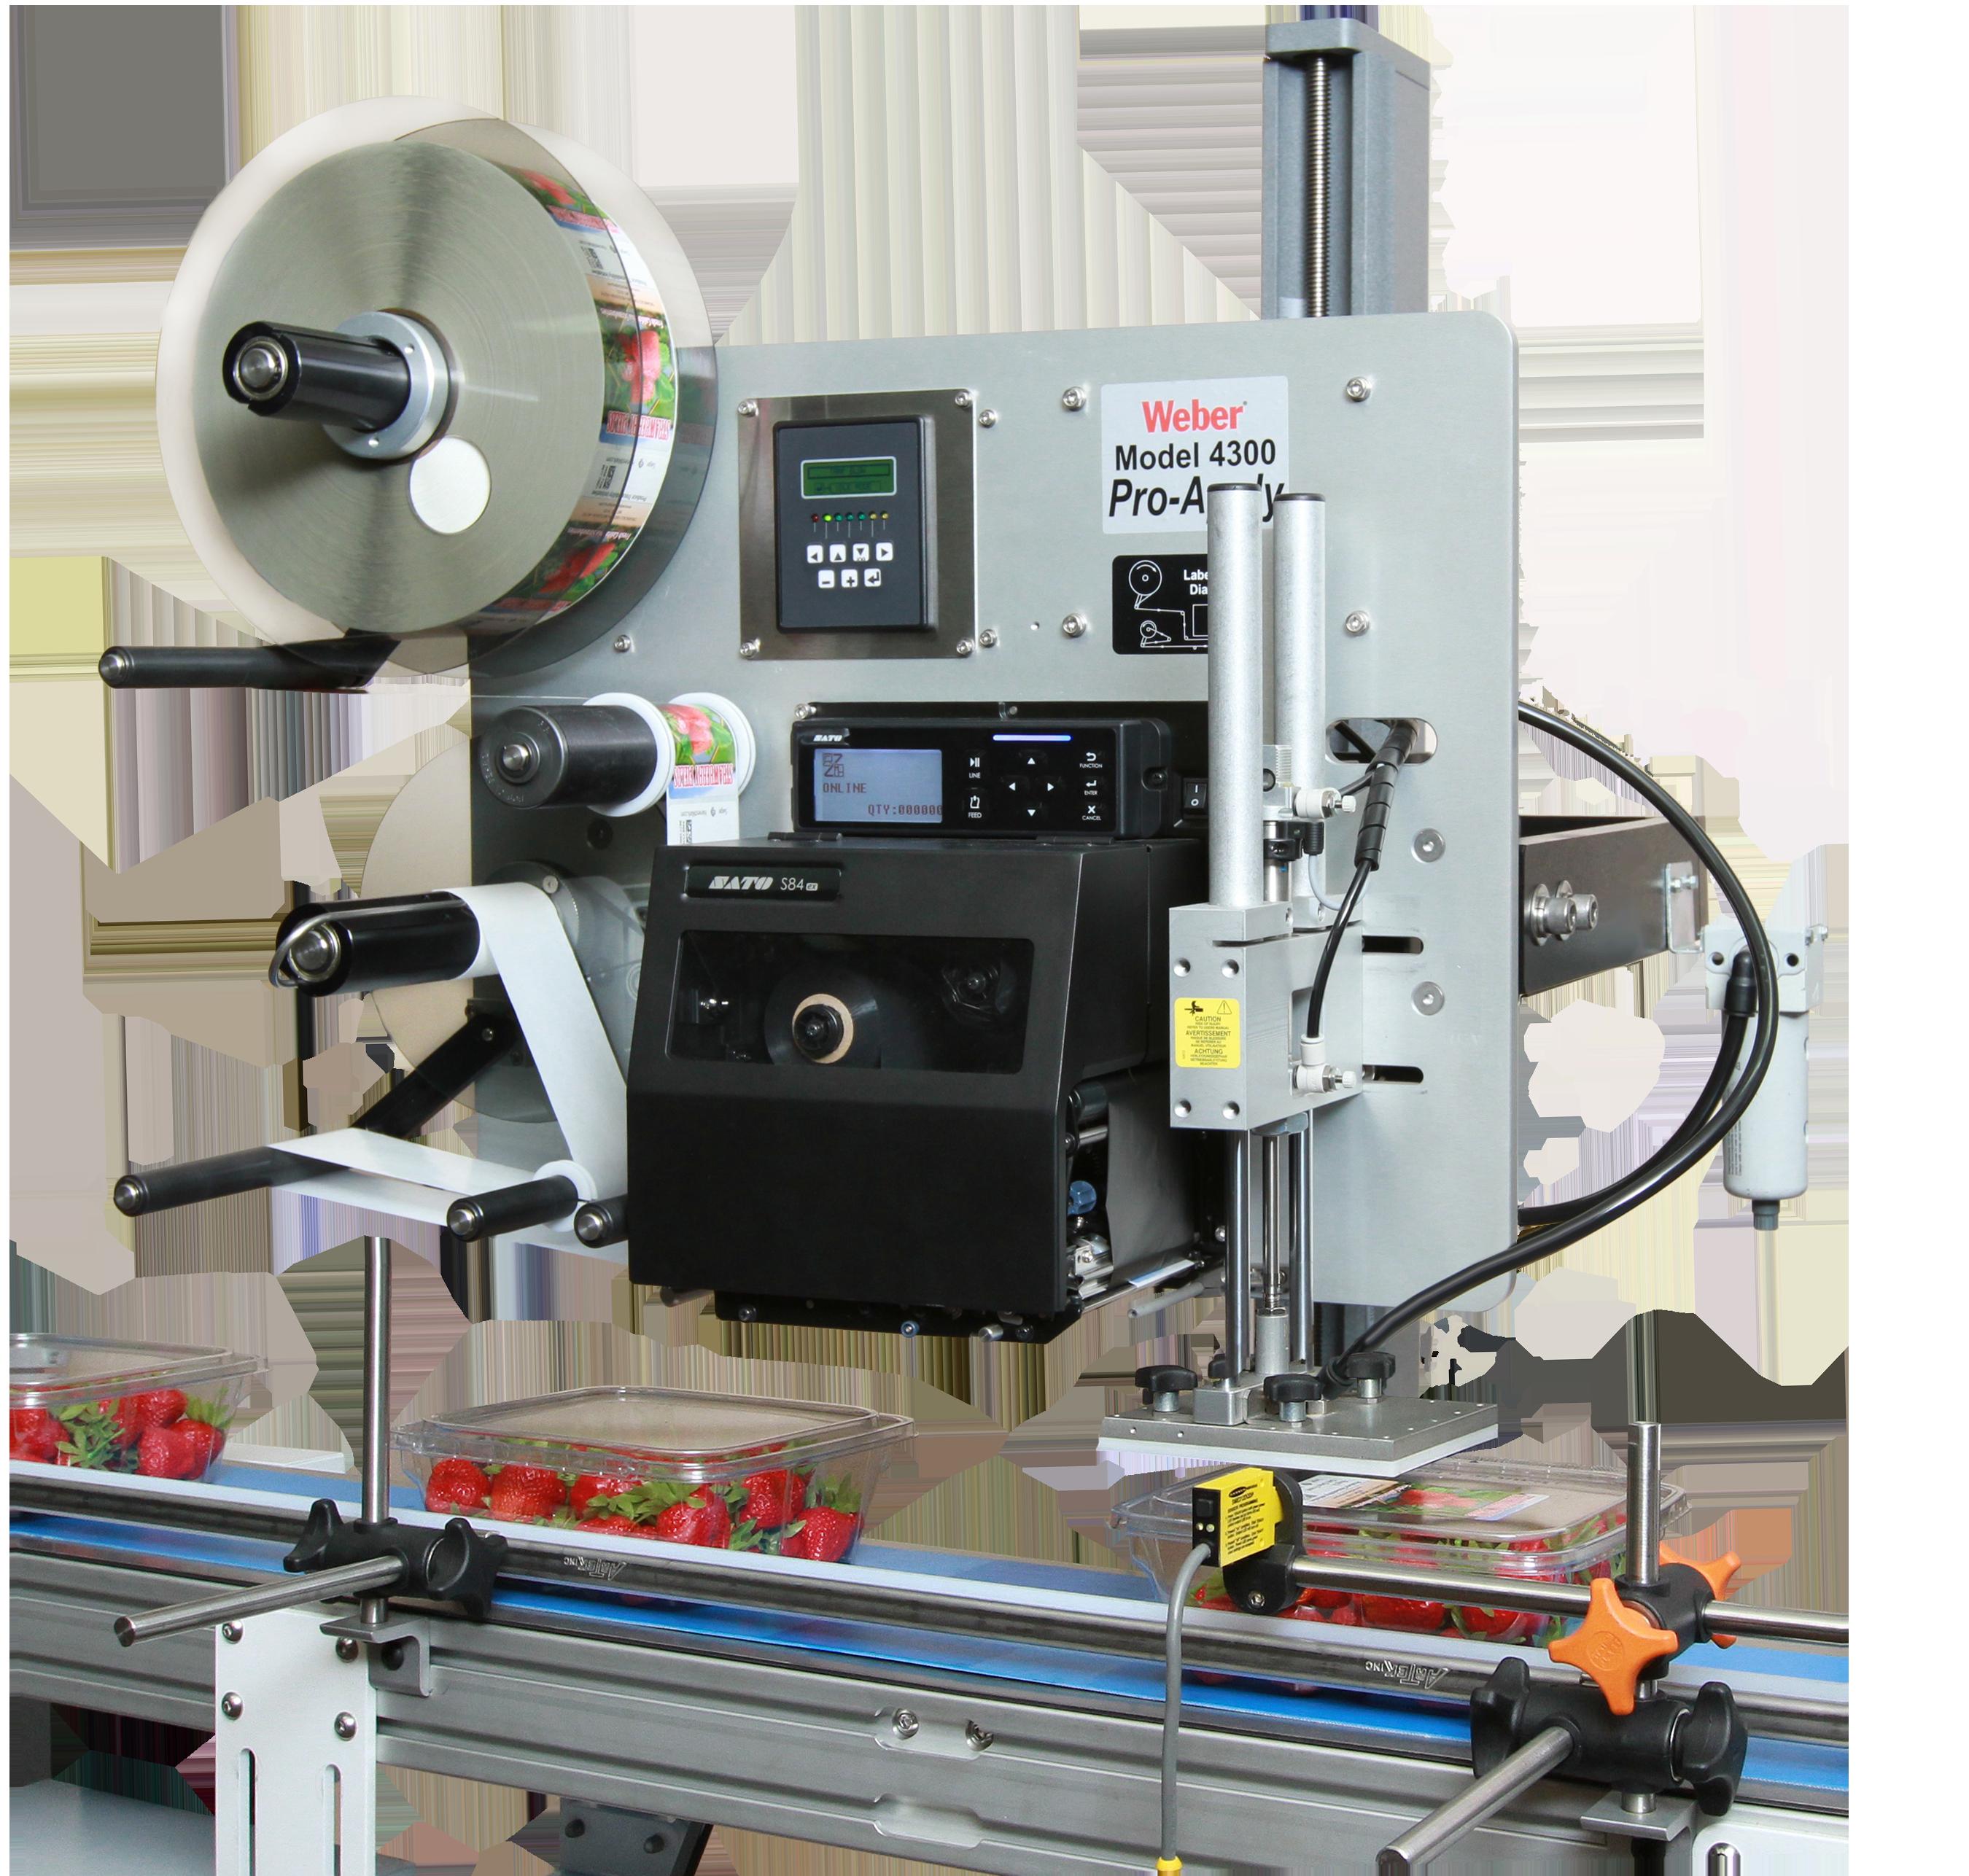 Weber's Model 4300 ProApply label printer applicator is